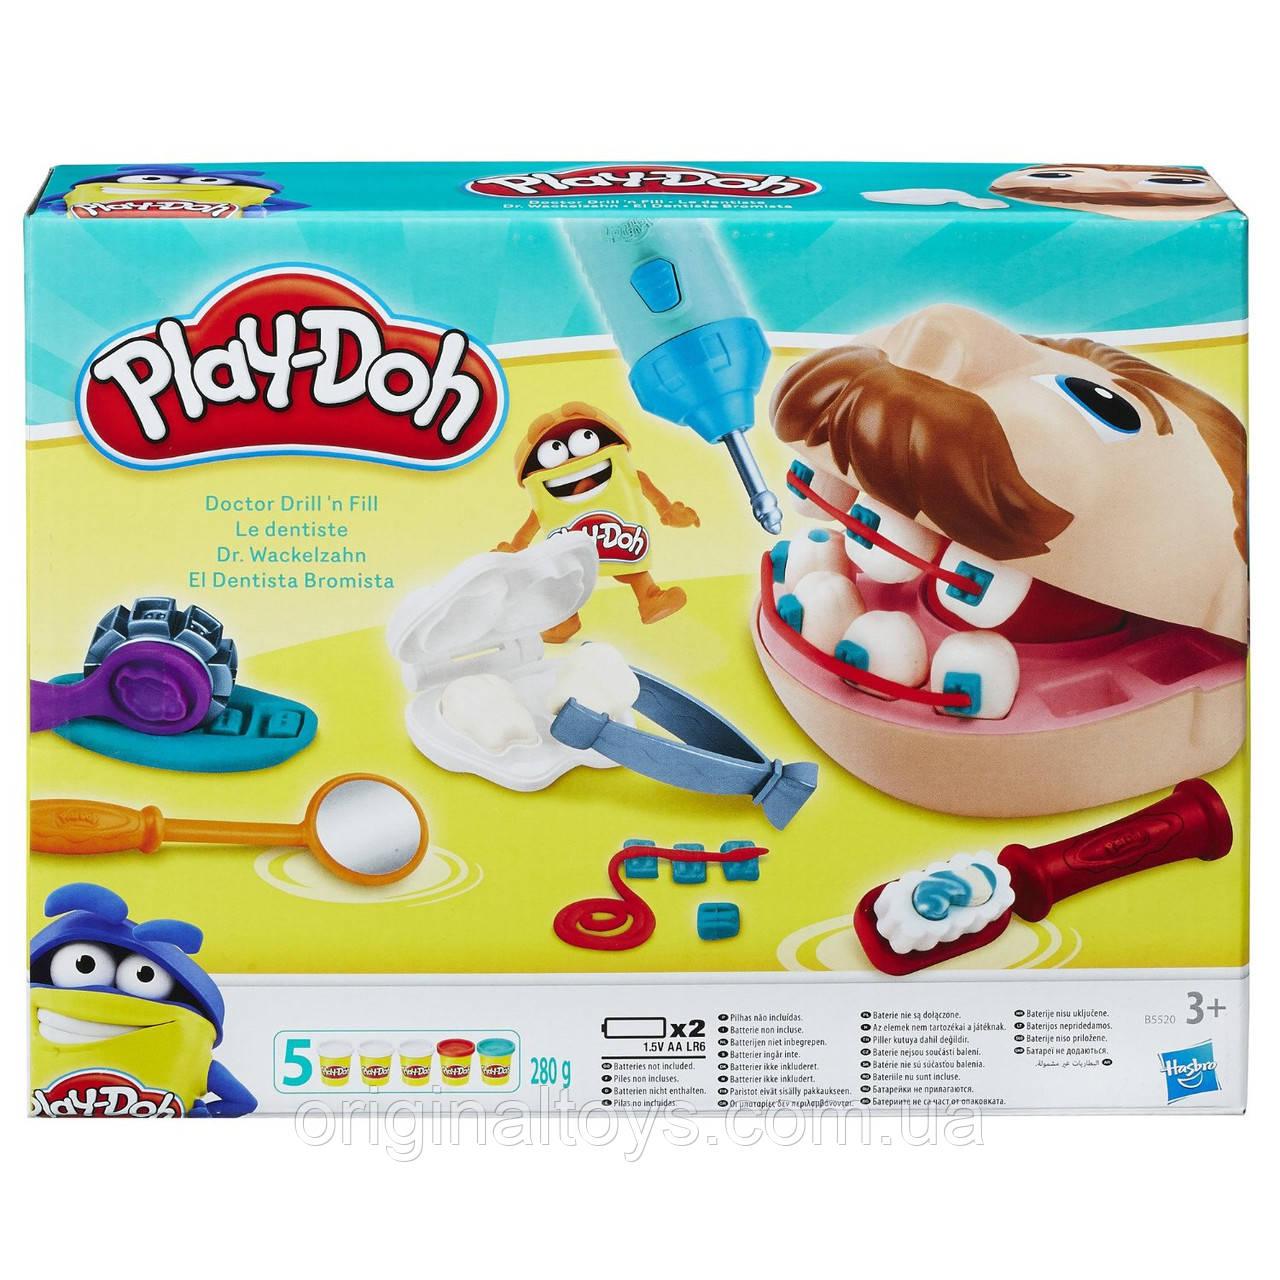 Игровой набор Play Doh Мистер Зубастик (2016) Hasbro B5520